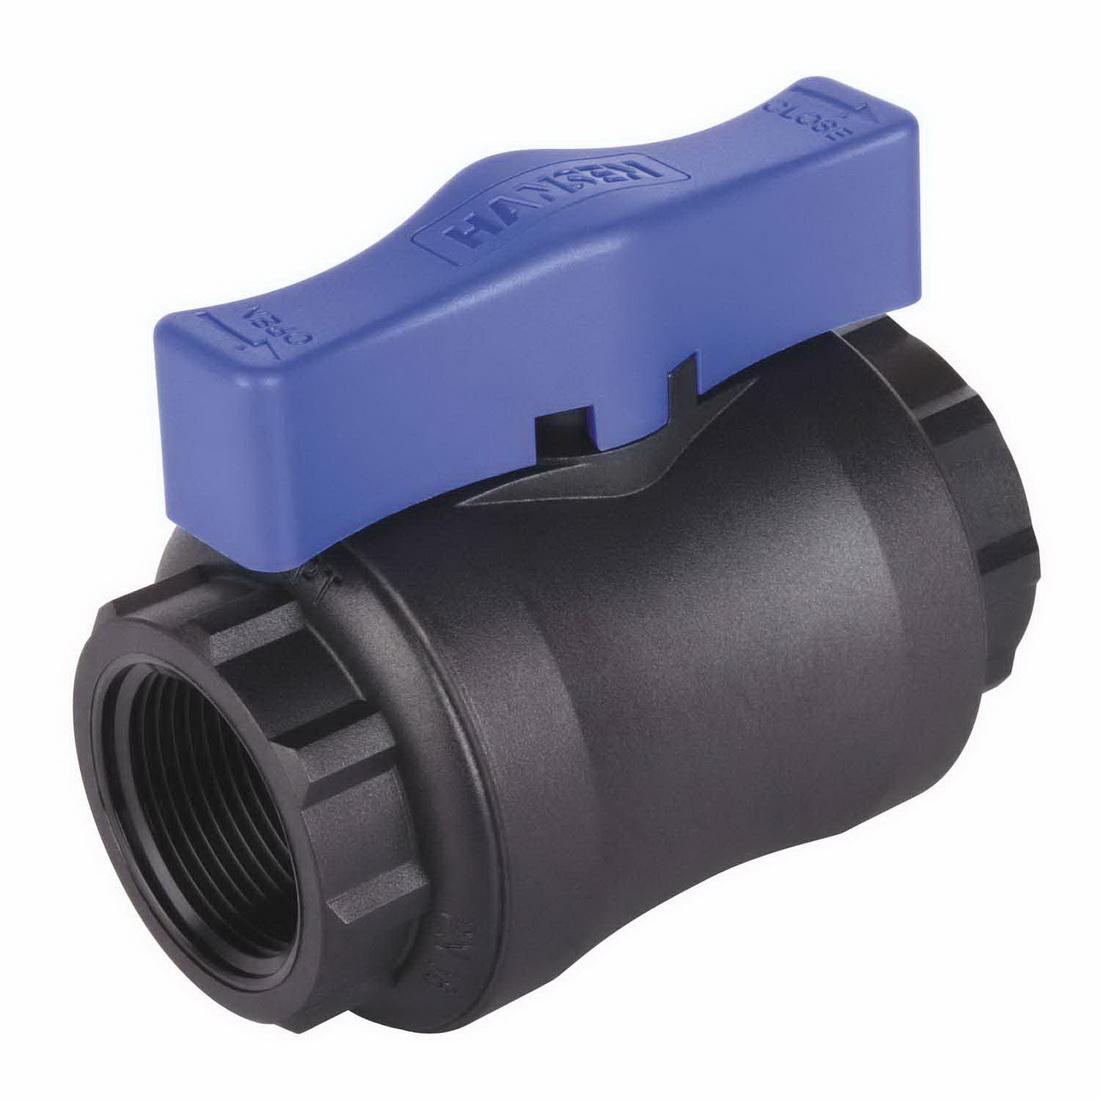 HBV Series Full Flow Compact Ball Valve 40mm F BSPT Glass Fibre Reinforced Nylon Black/Blue